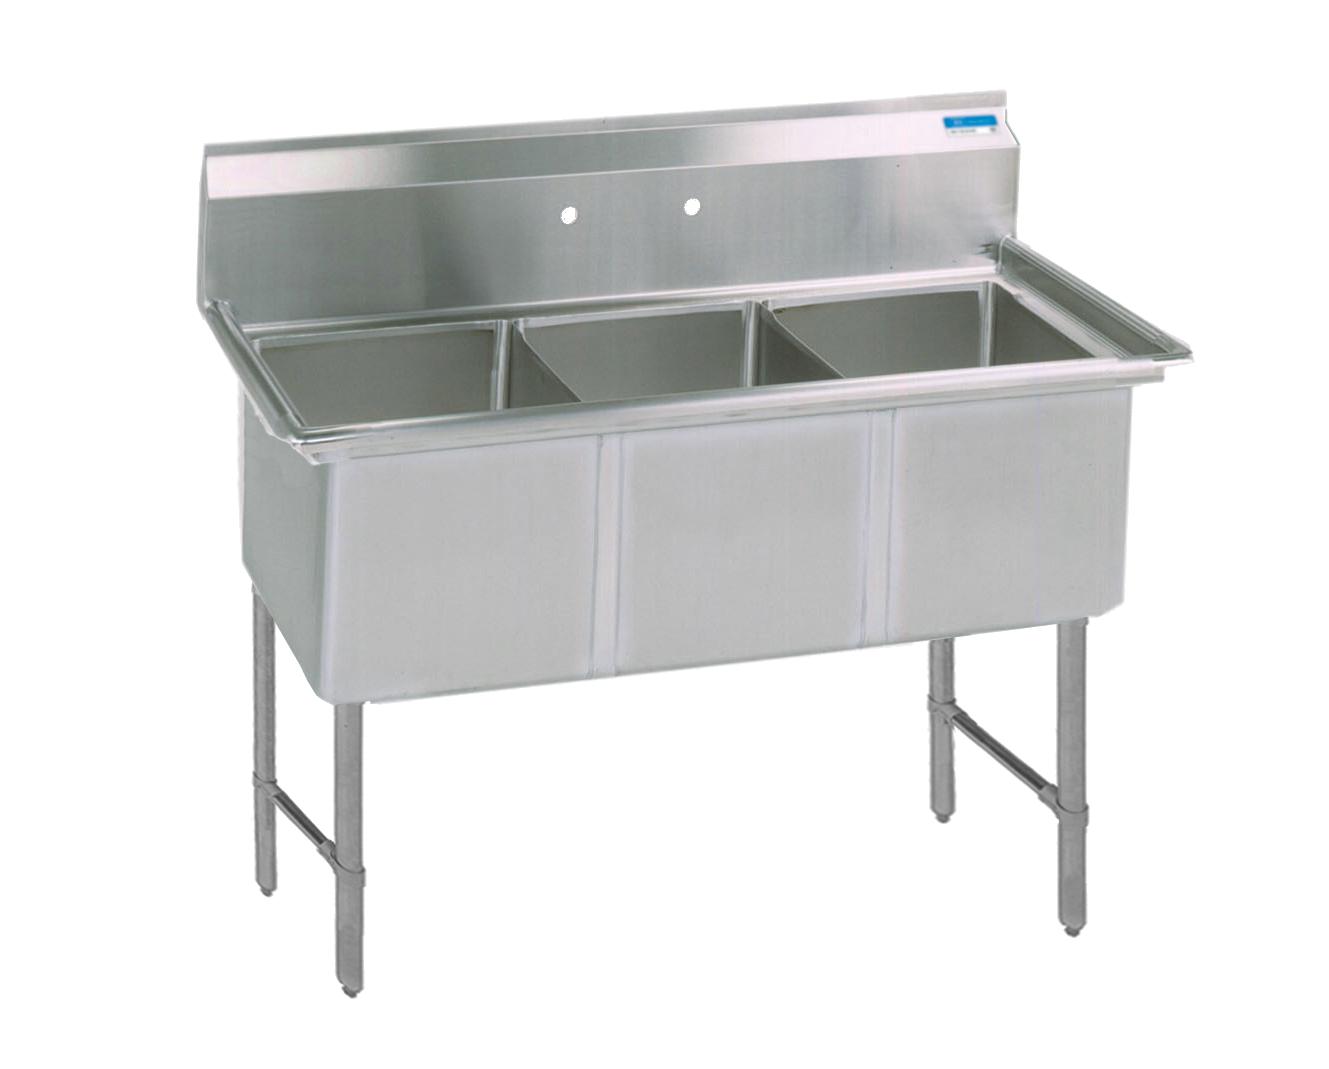 BK Resources BKS6-3-1620-14S sink, (3) three compartment